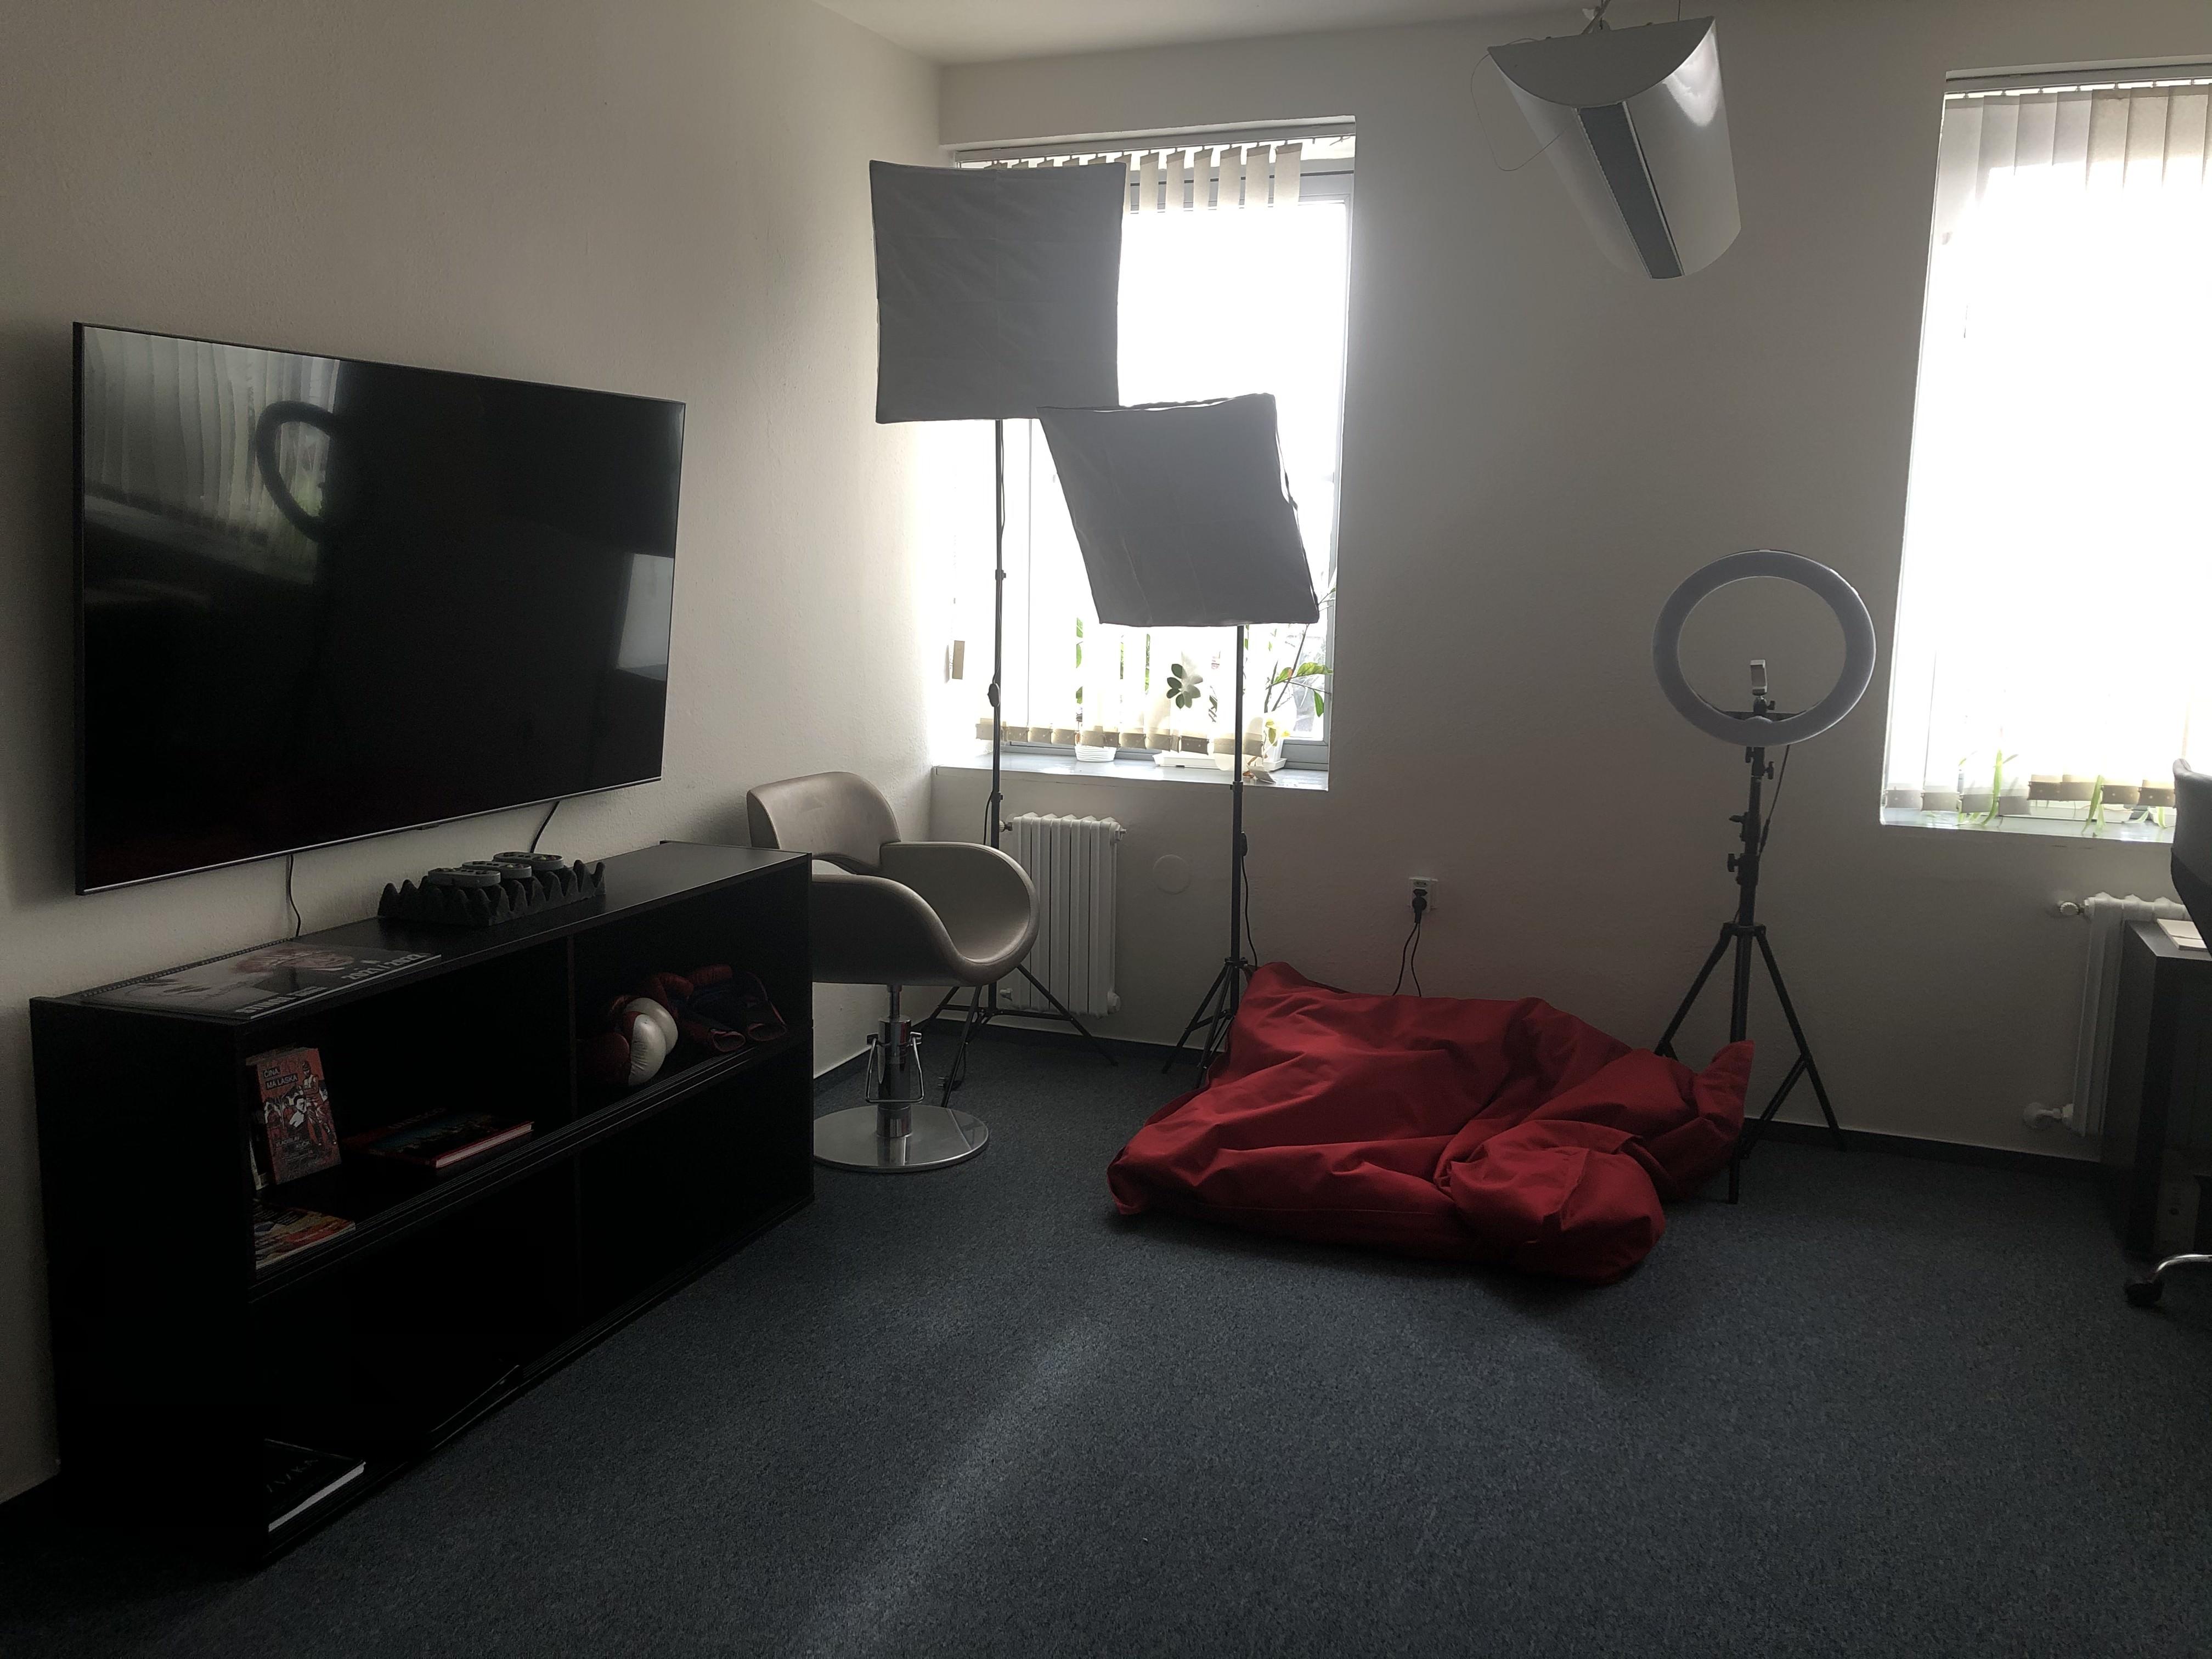 creative_room